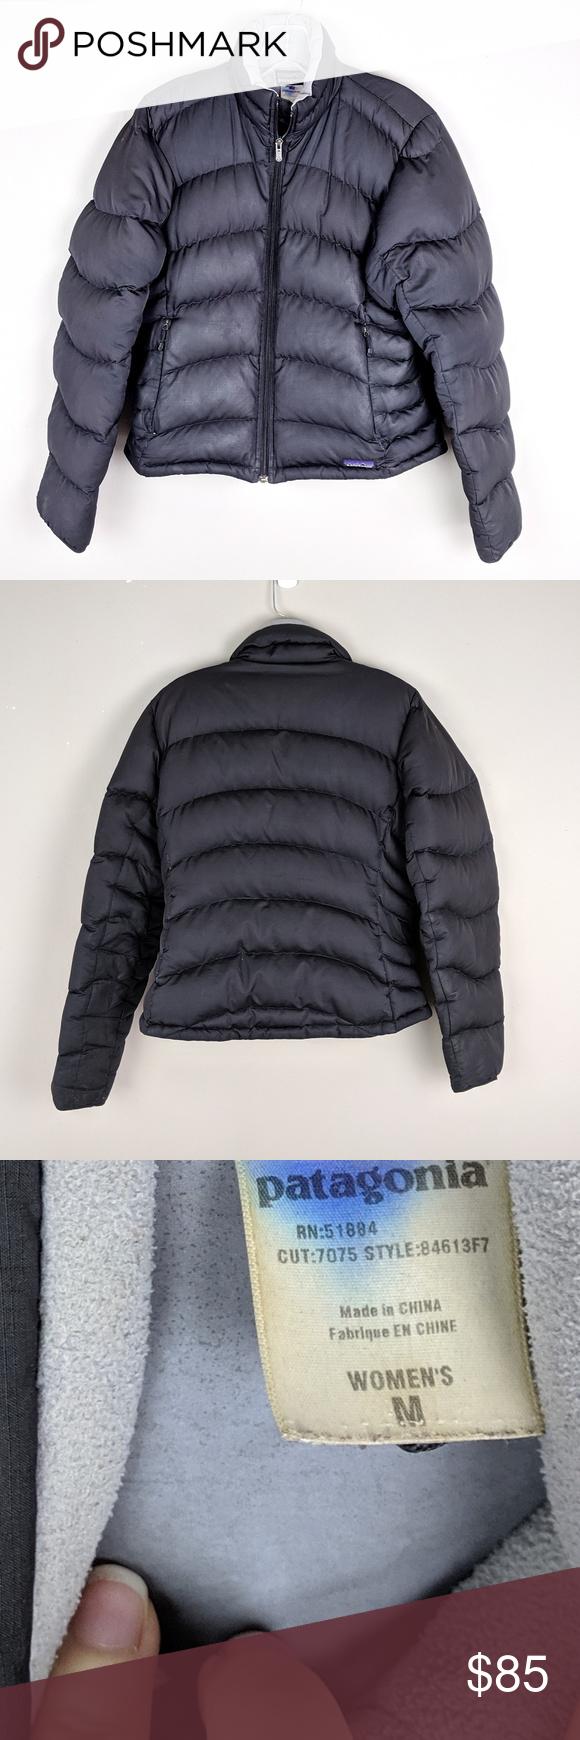 Patagonia Black Puffer Jacket A9 Black Puffer Jacket Black Puffer Jackets [ 1740 x 580 Pixel ]